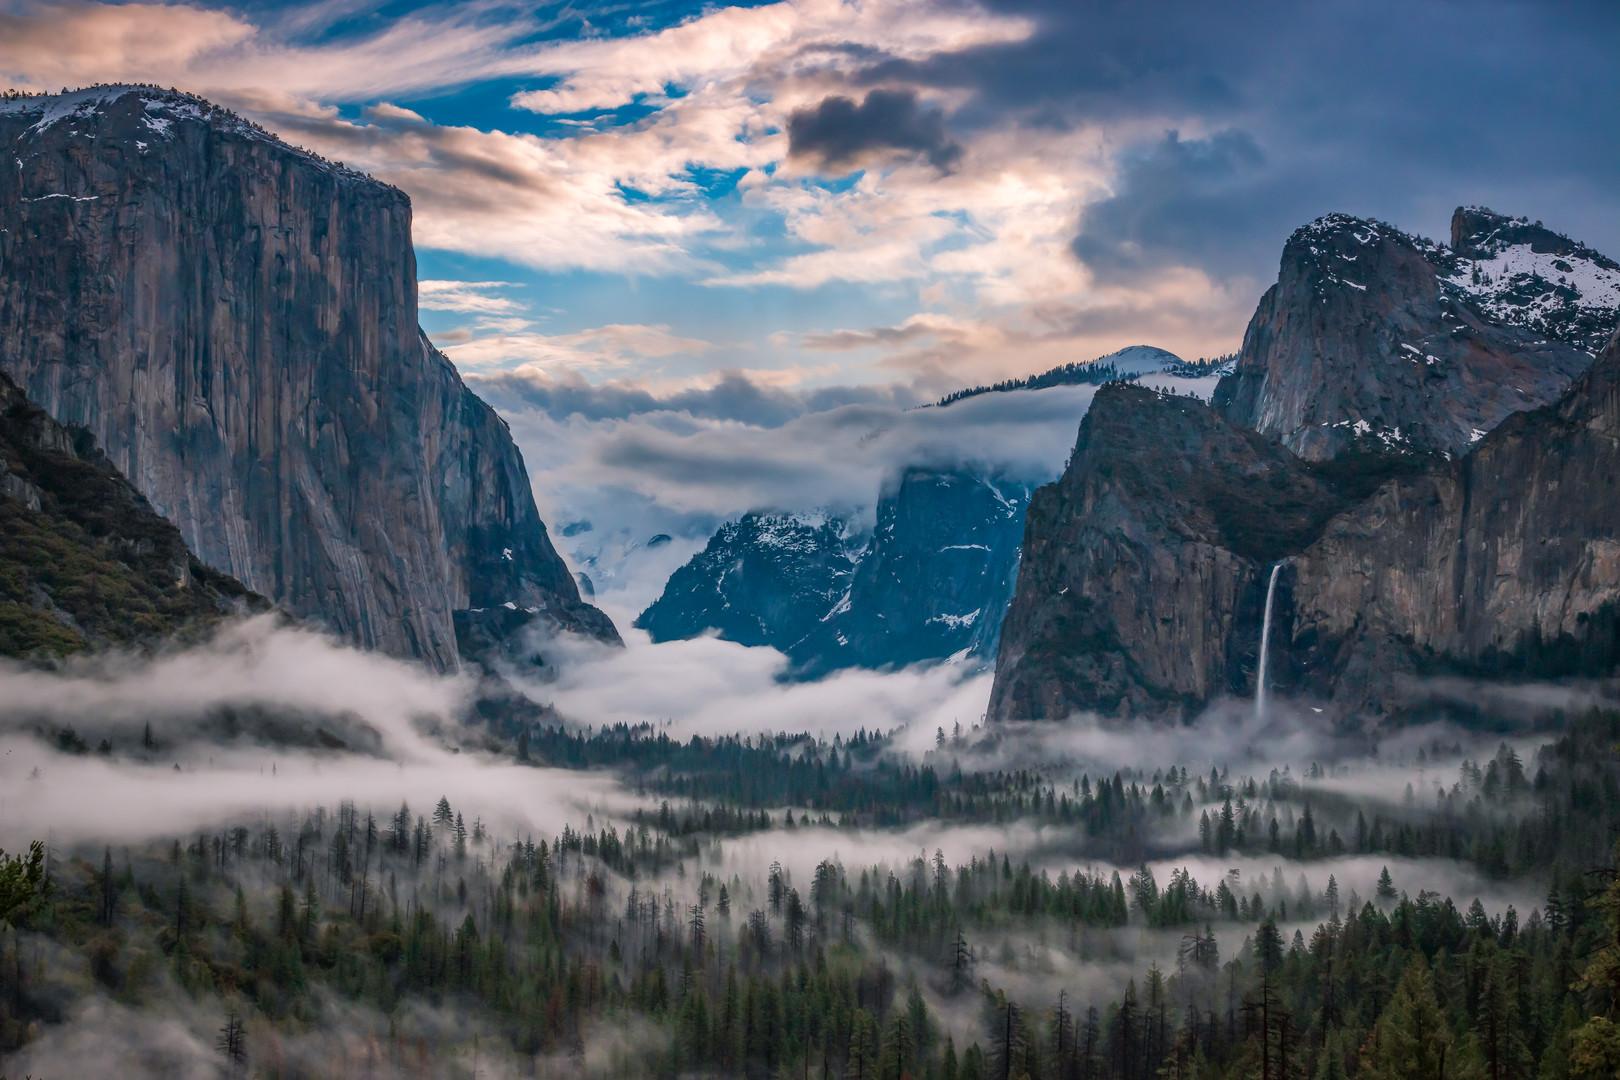 Foggy Sunrise in Yosemite